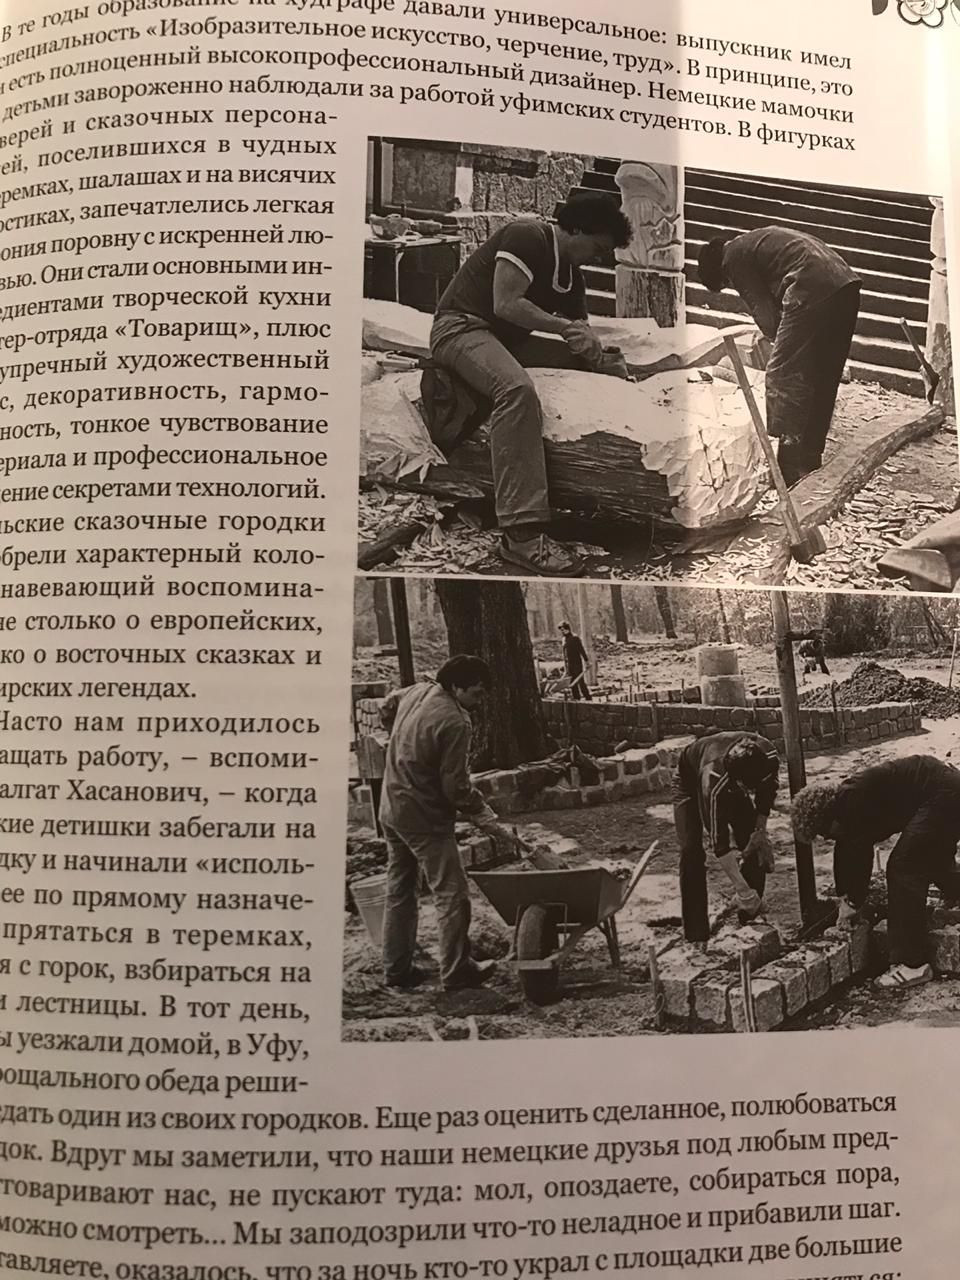 Встреча с деканом худграфа БГПУ Талгатом Масалимовым